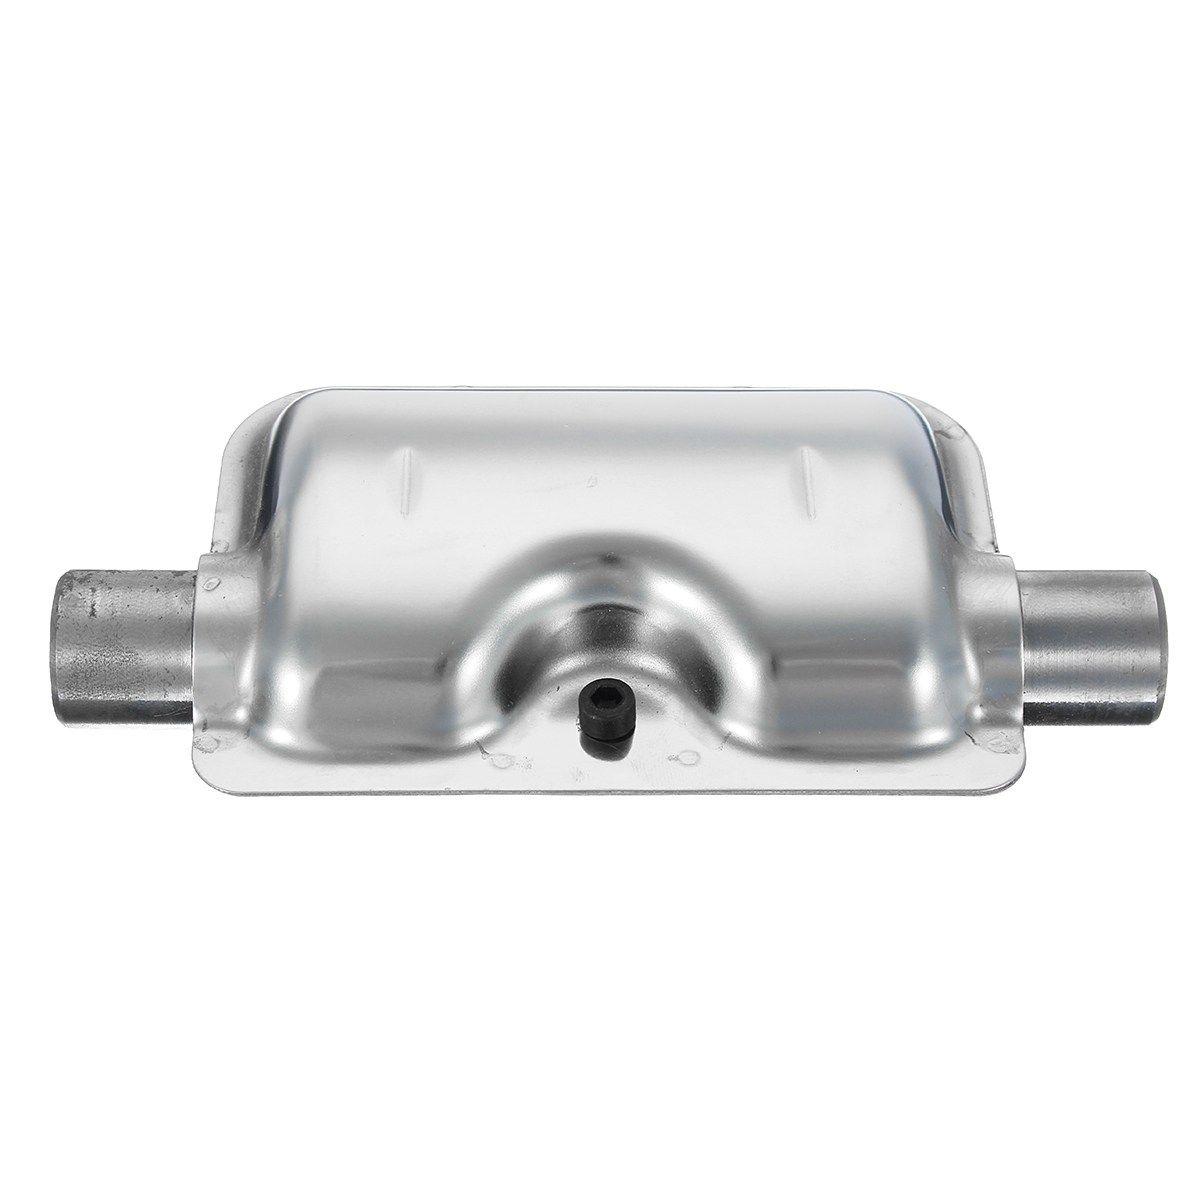 24mm/ 0.9inch Car Exhaust Silencer Muffler for Webasto Eberspacher Heater Portable Silver